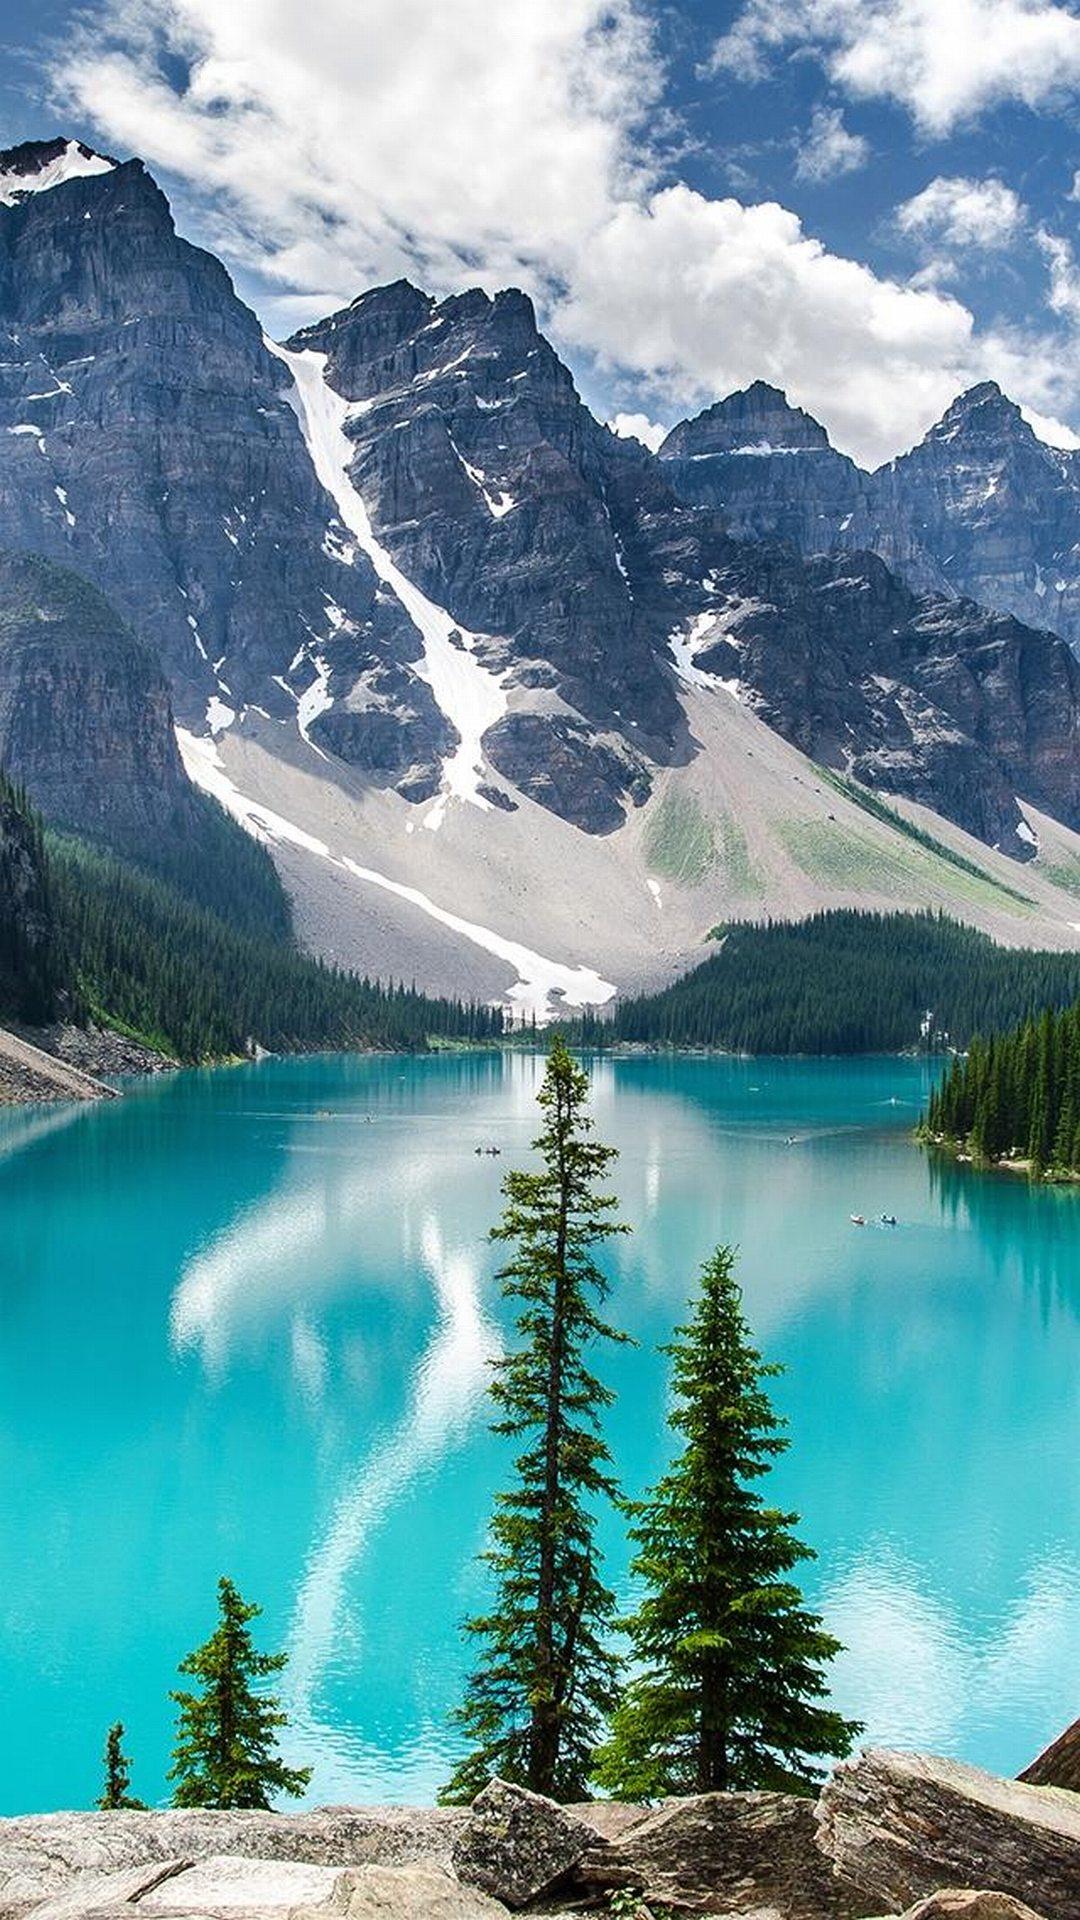 Mountain blue lake